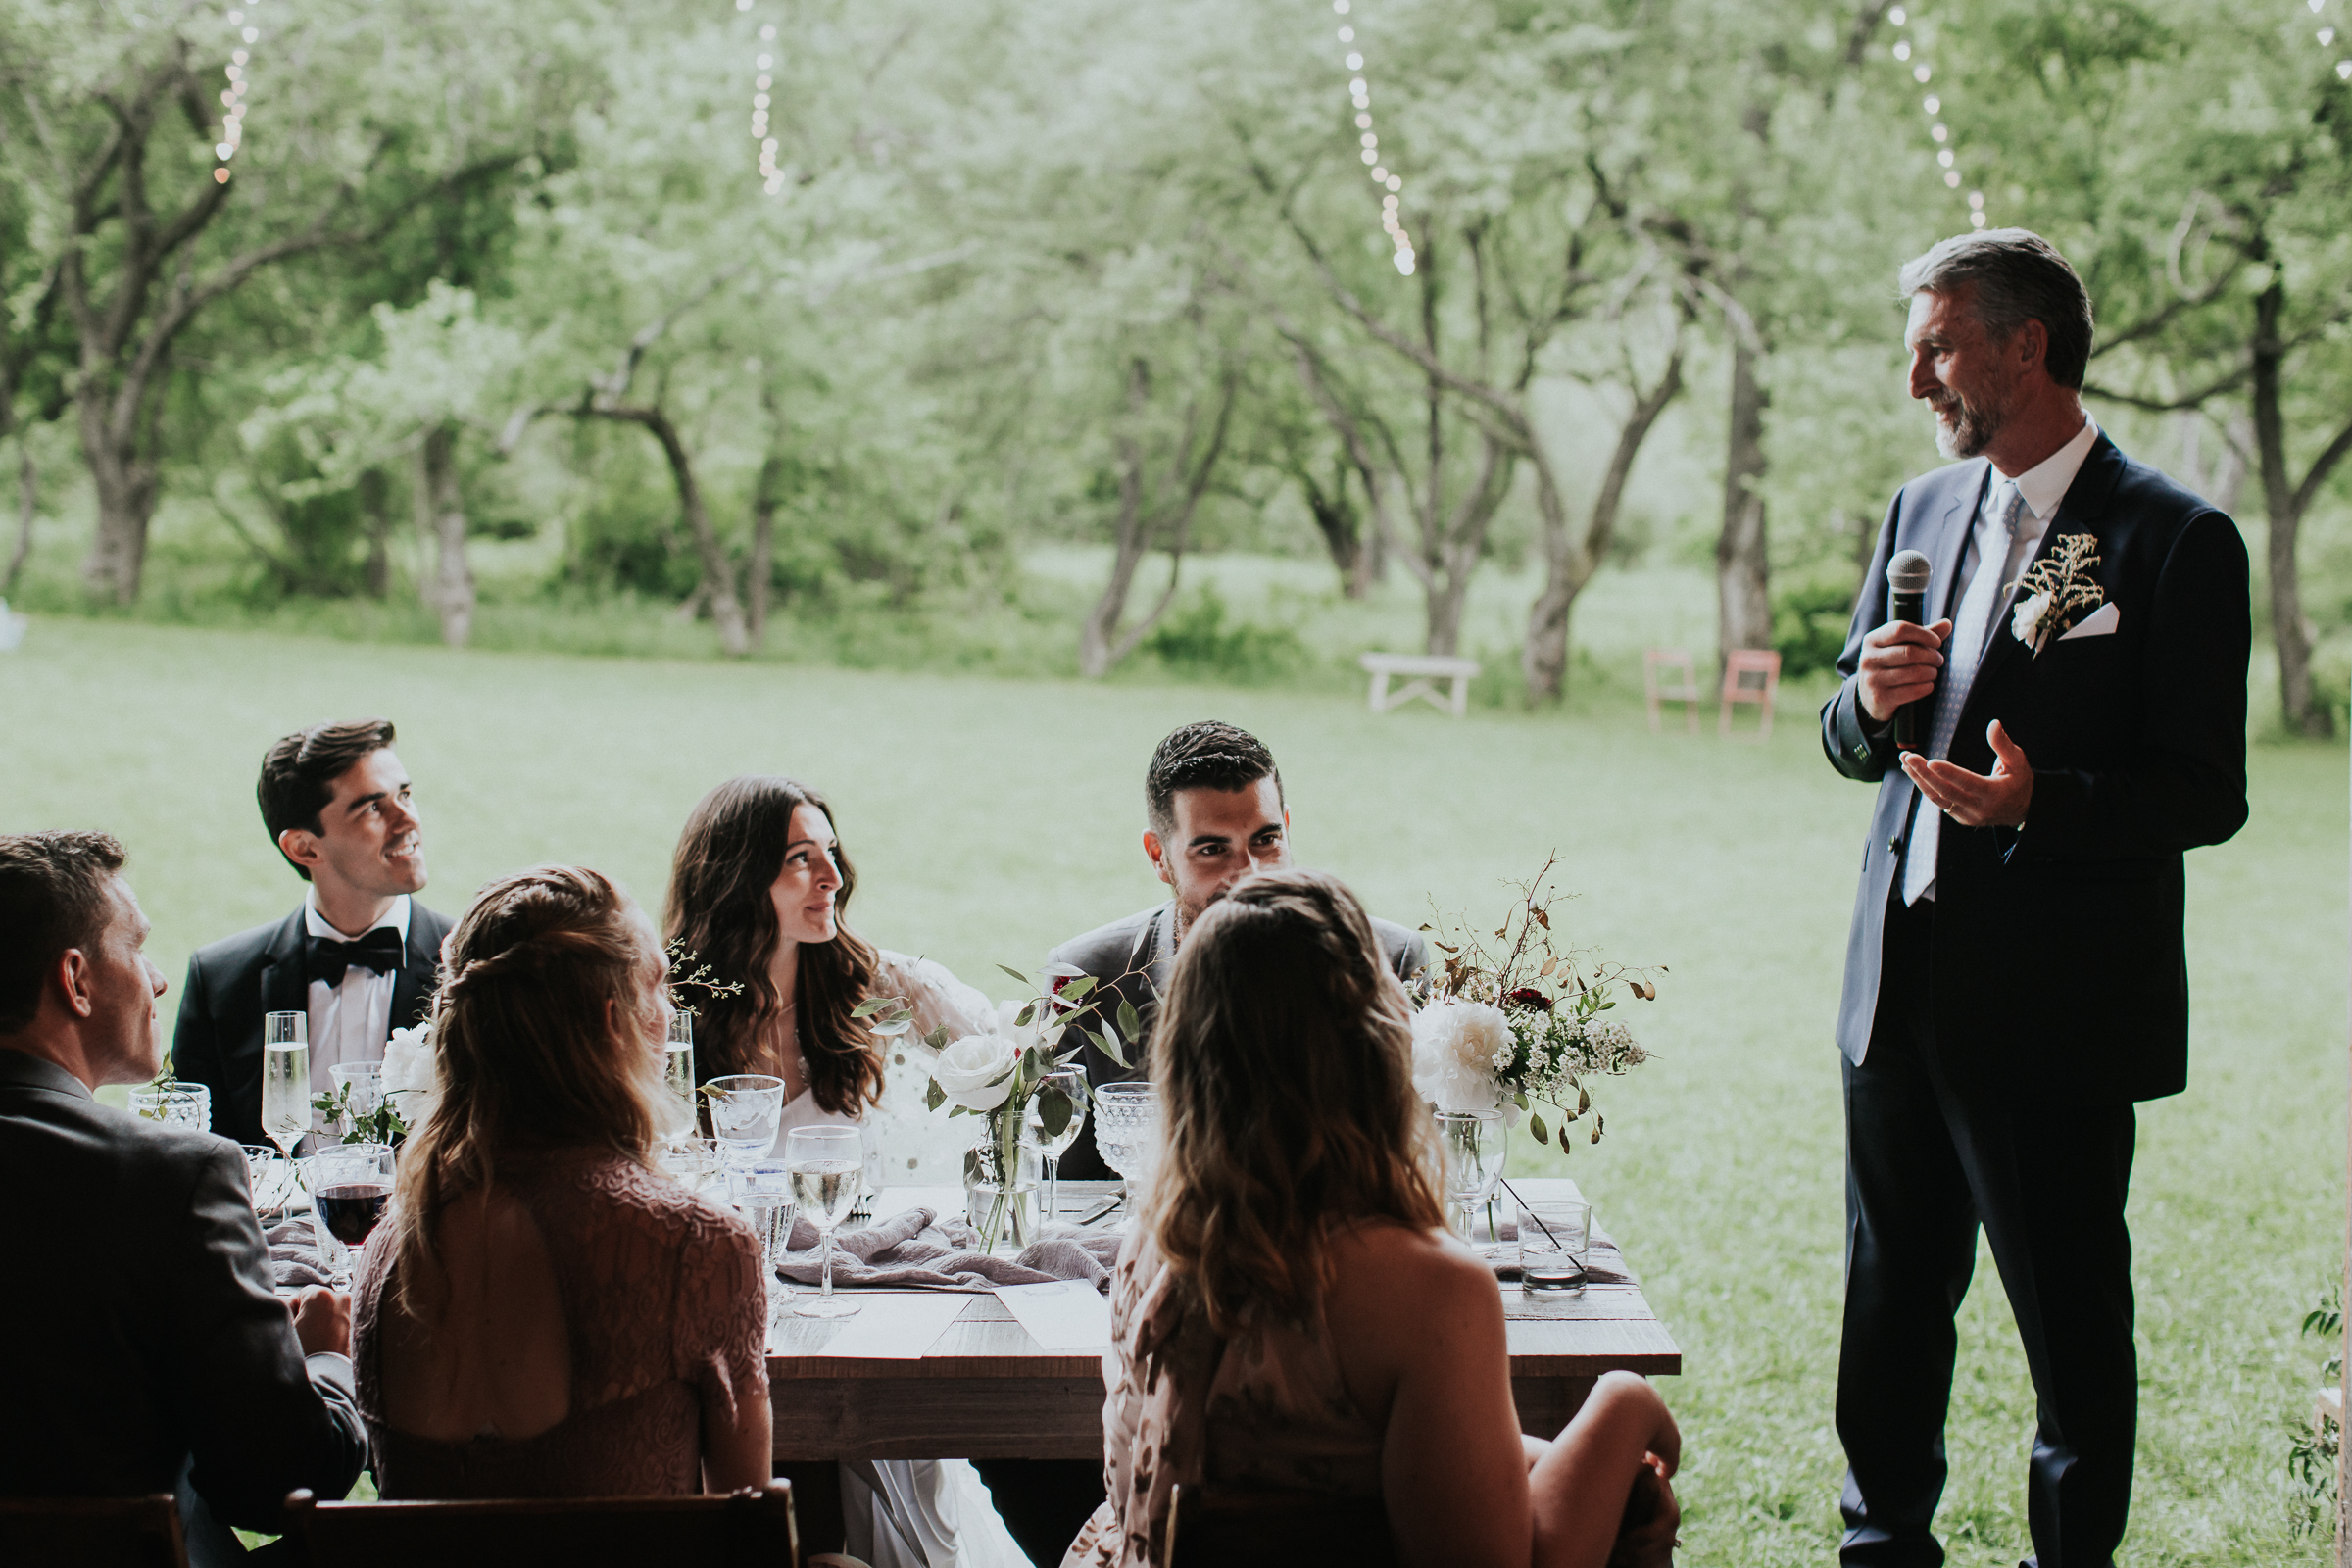 Handsome-Hollow-Long-Eddy-Catskills-New-York-Fine-Art-Documentary-Wedding-Photographer-111.jpg